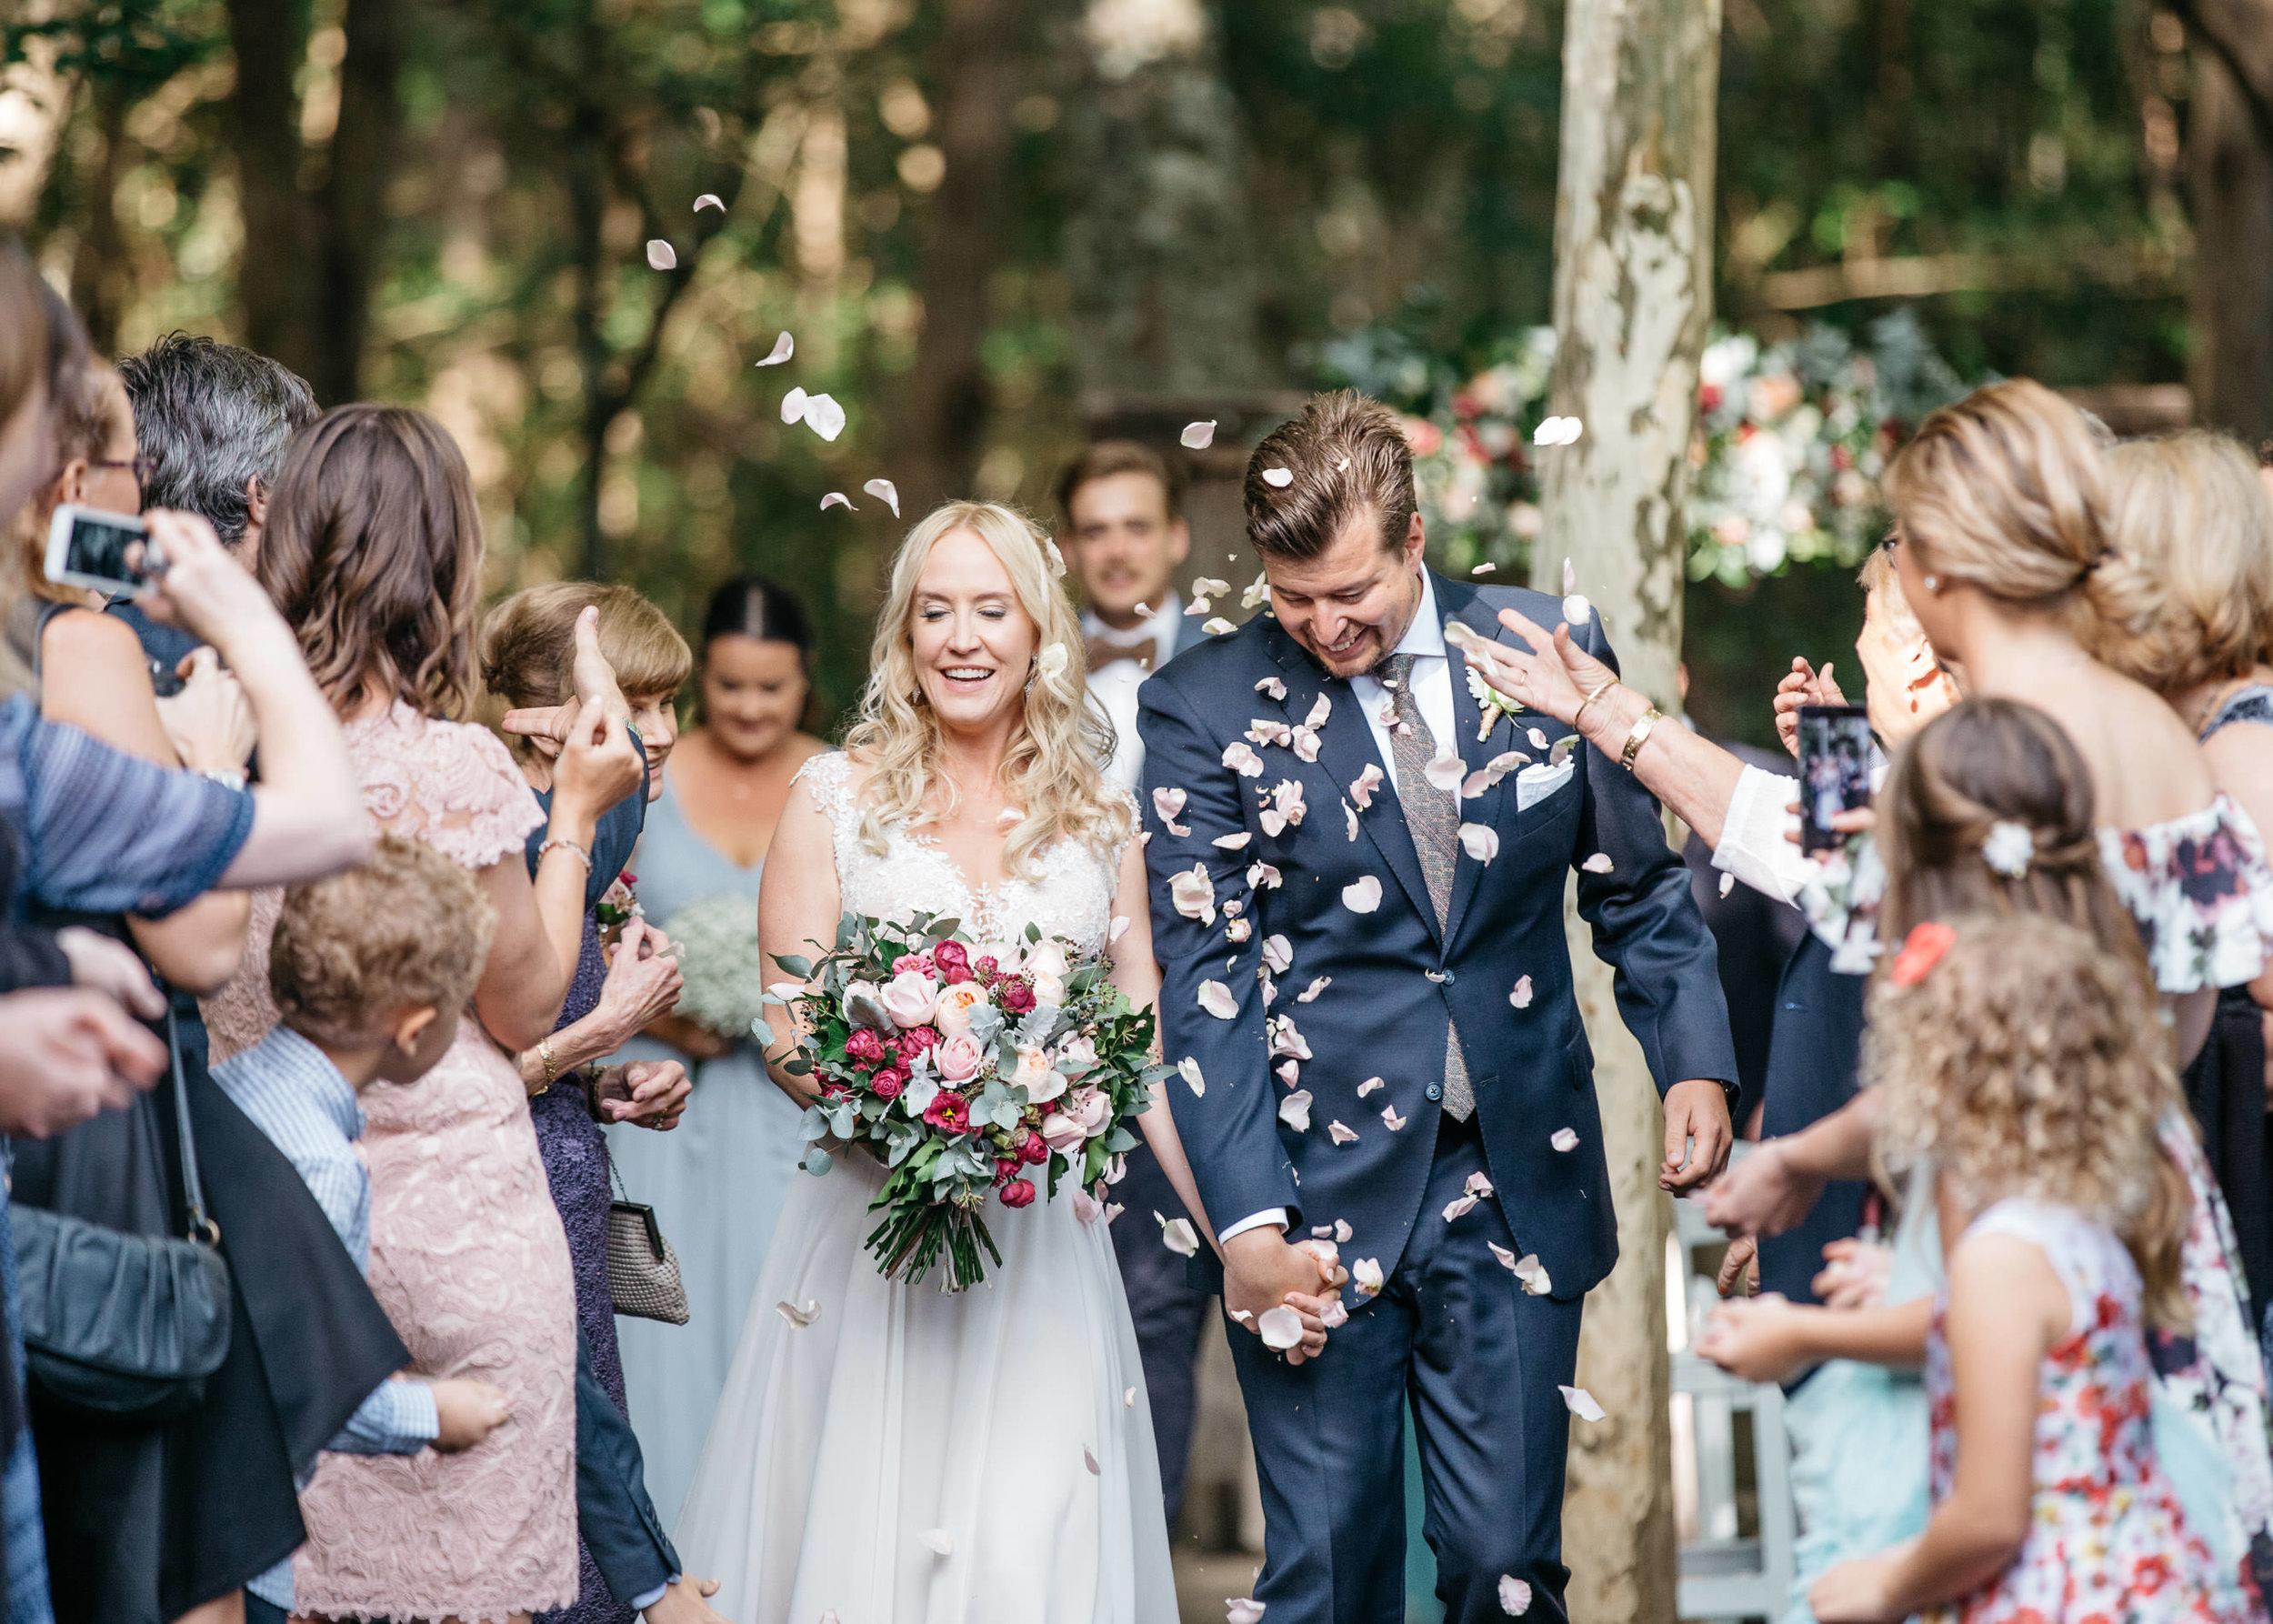 True North Photography_Boomerang Farm_Stacey and Isaac_Gold Coast Wedding_Barm Wedding_Hinterland Wedding-112.jpg